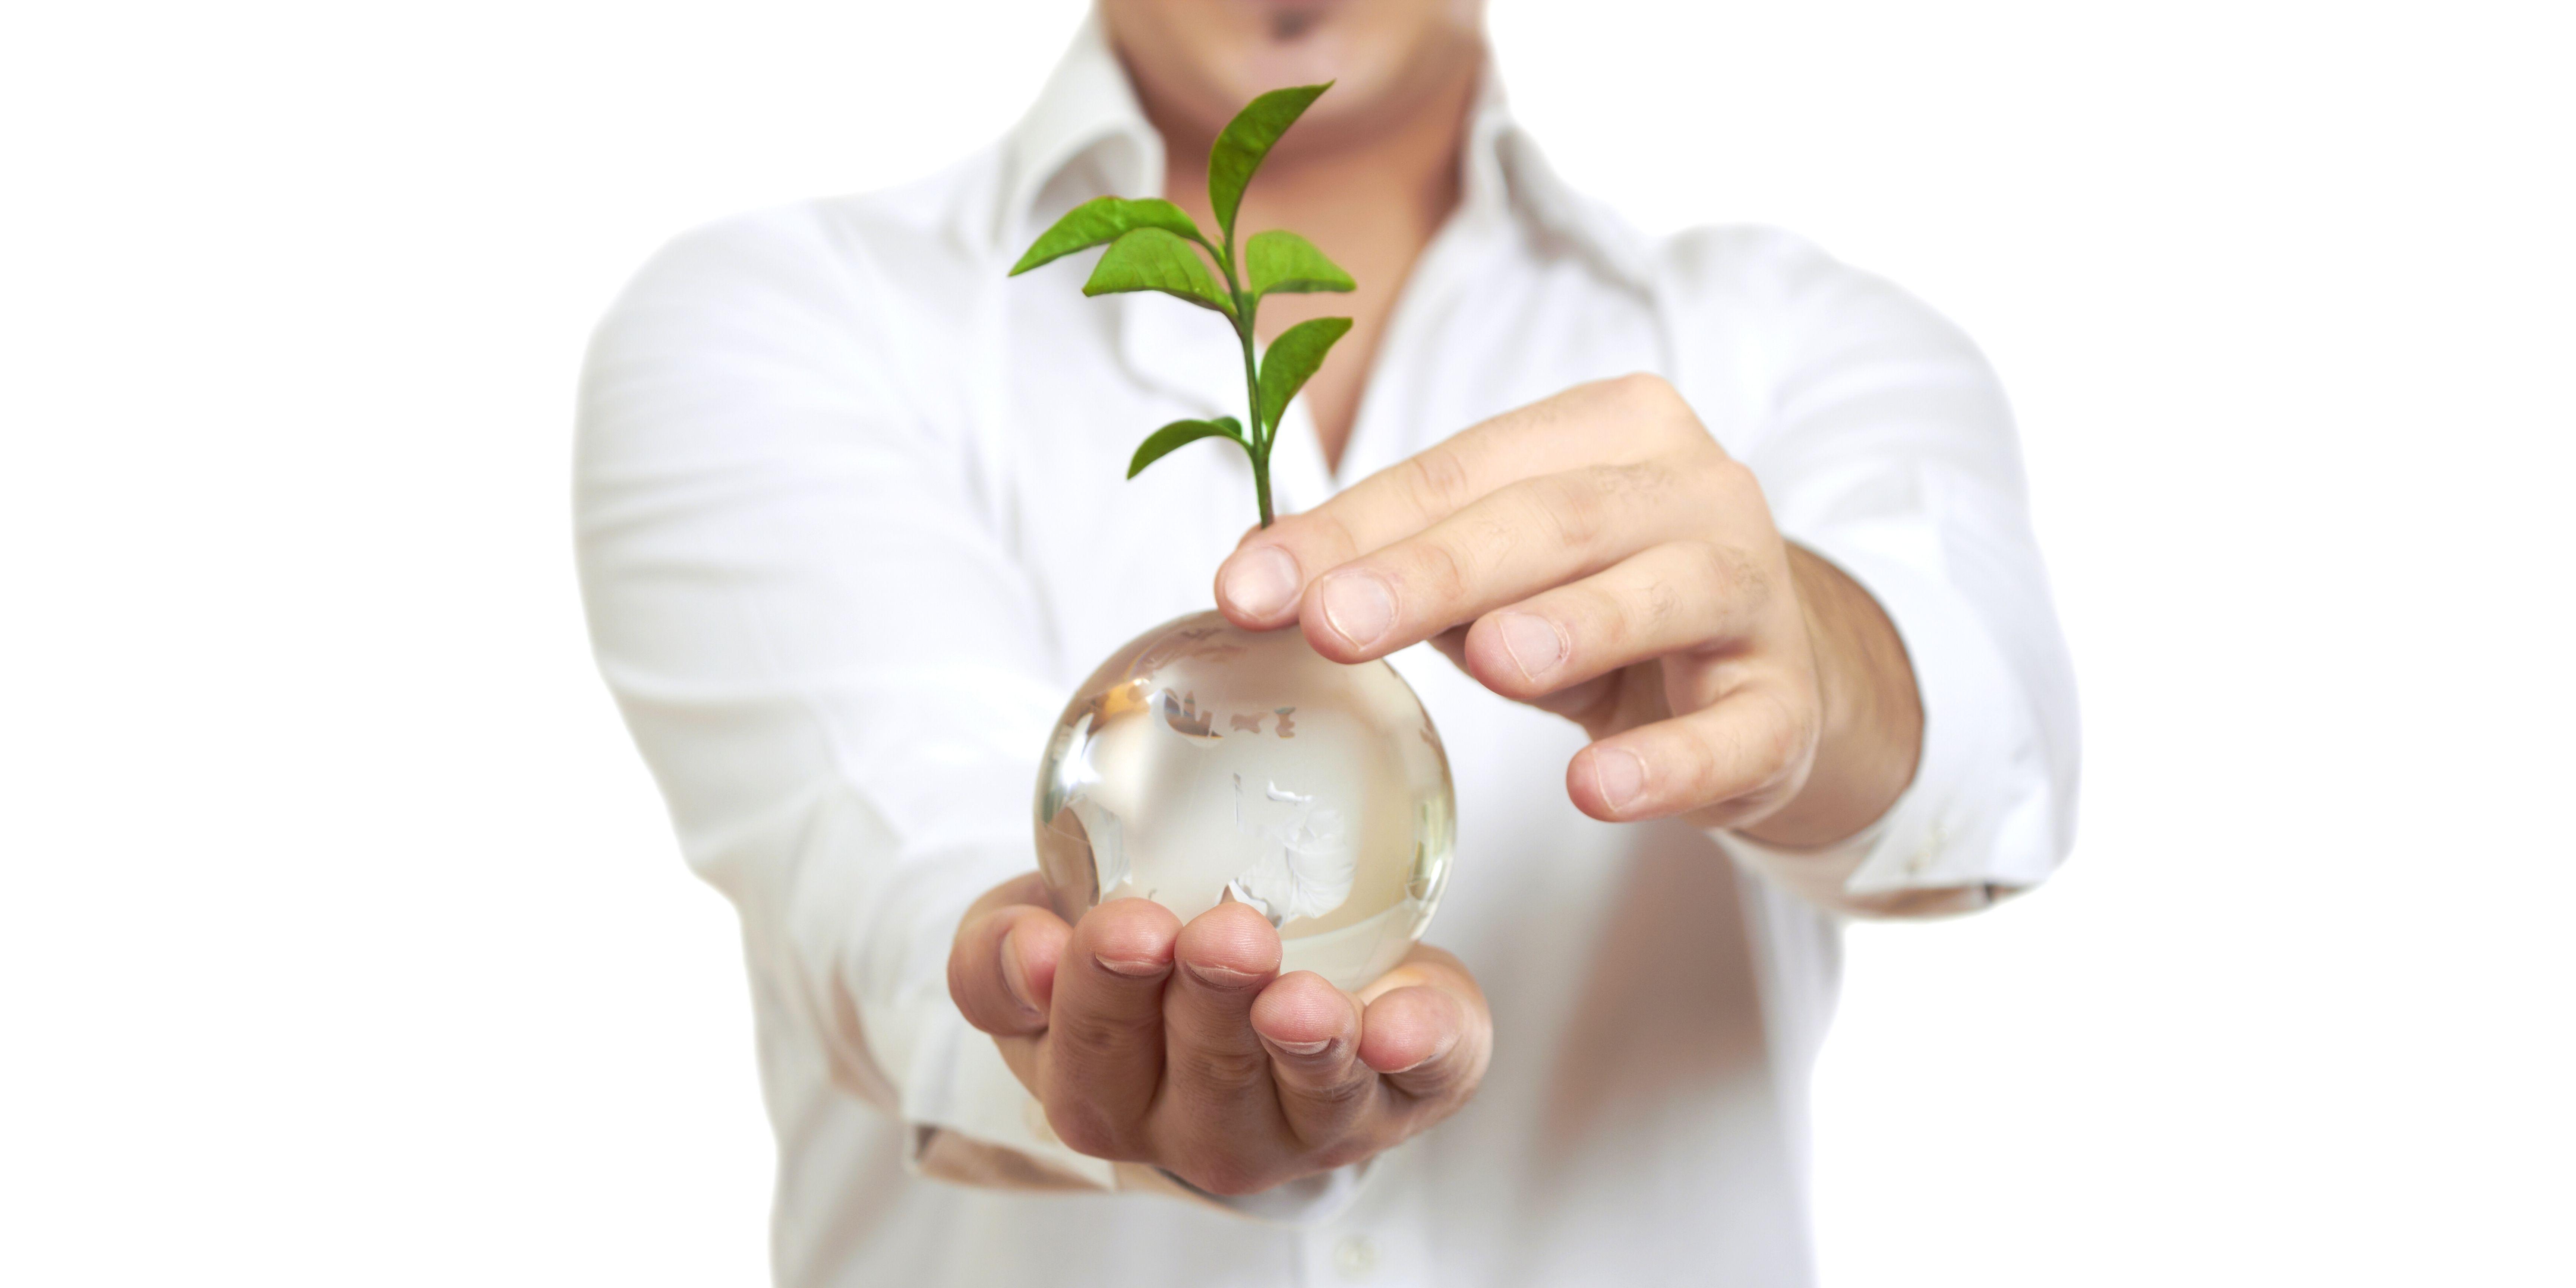 Sustainable living, Langkah Kecil Bagi Perubahan Bumi 5